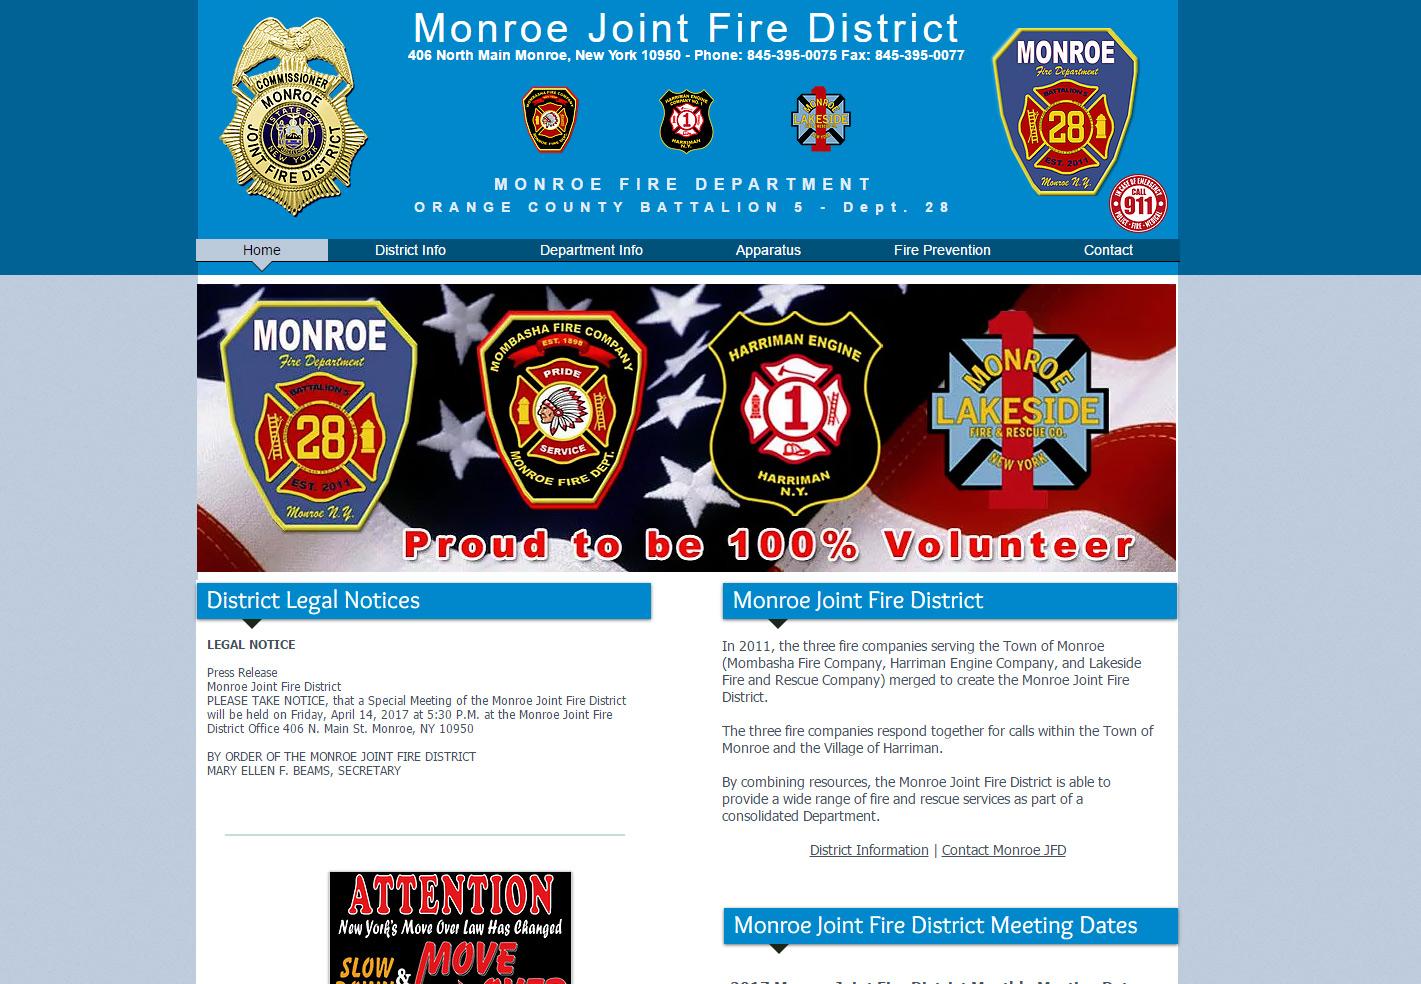 wwwmonroefiredistrictcom